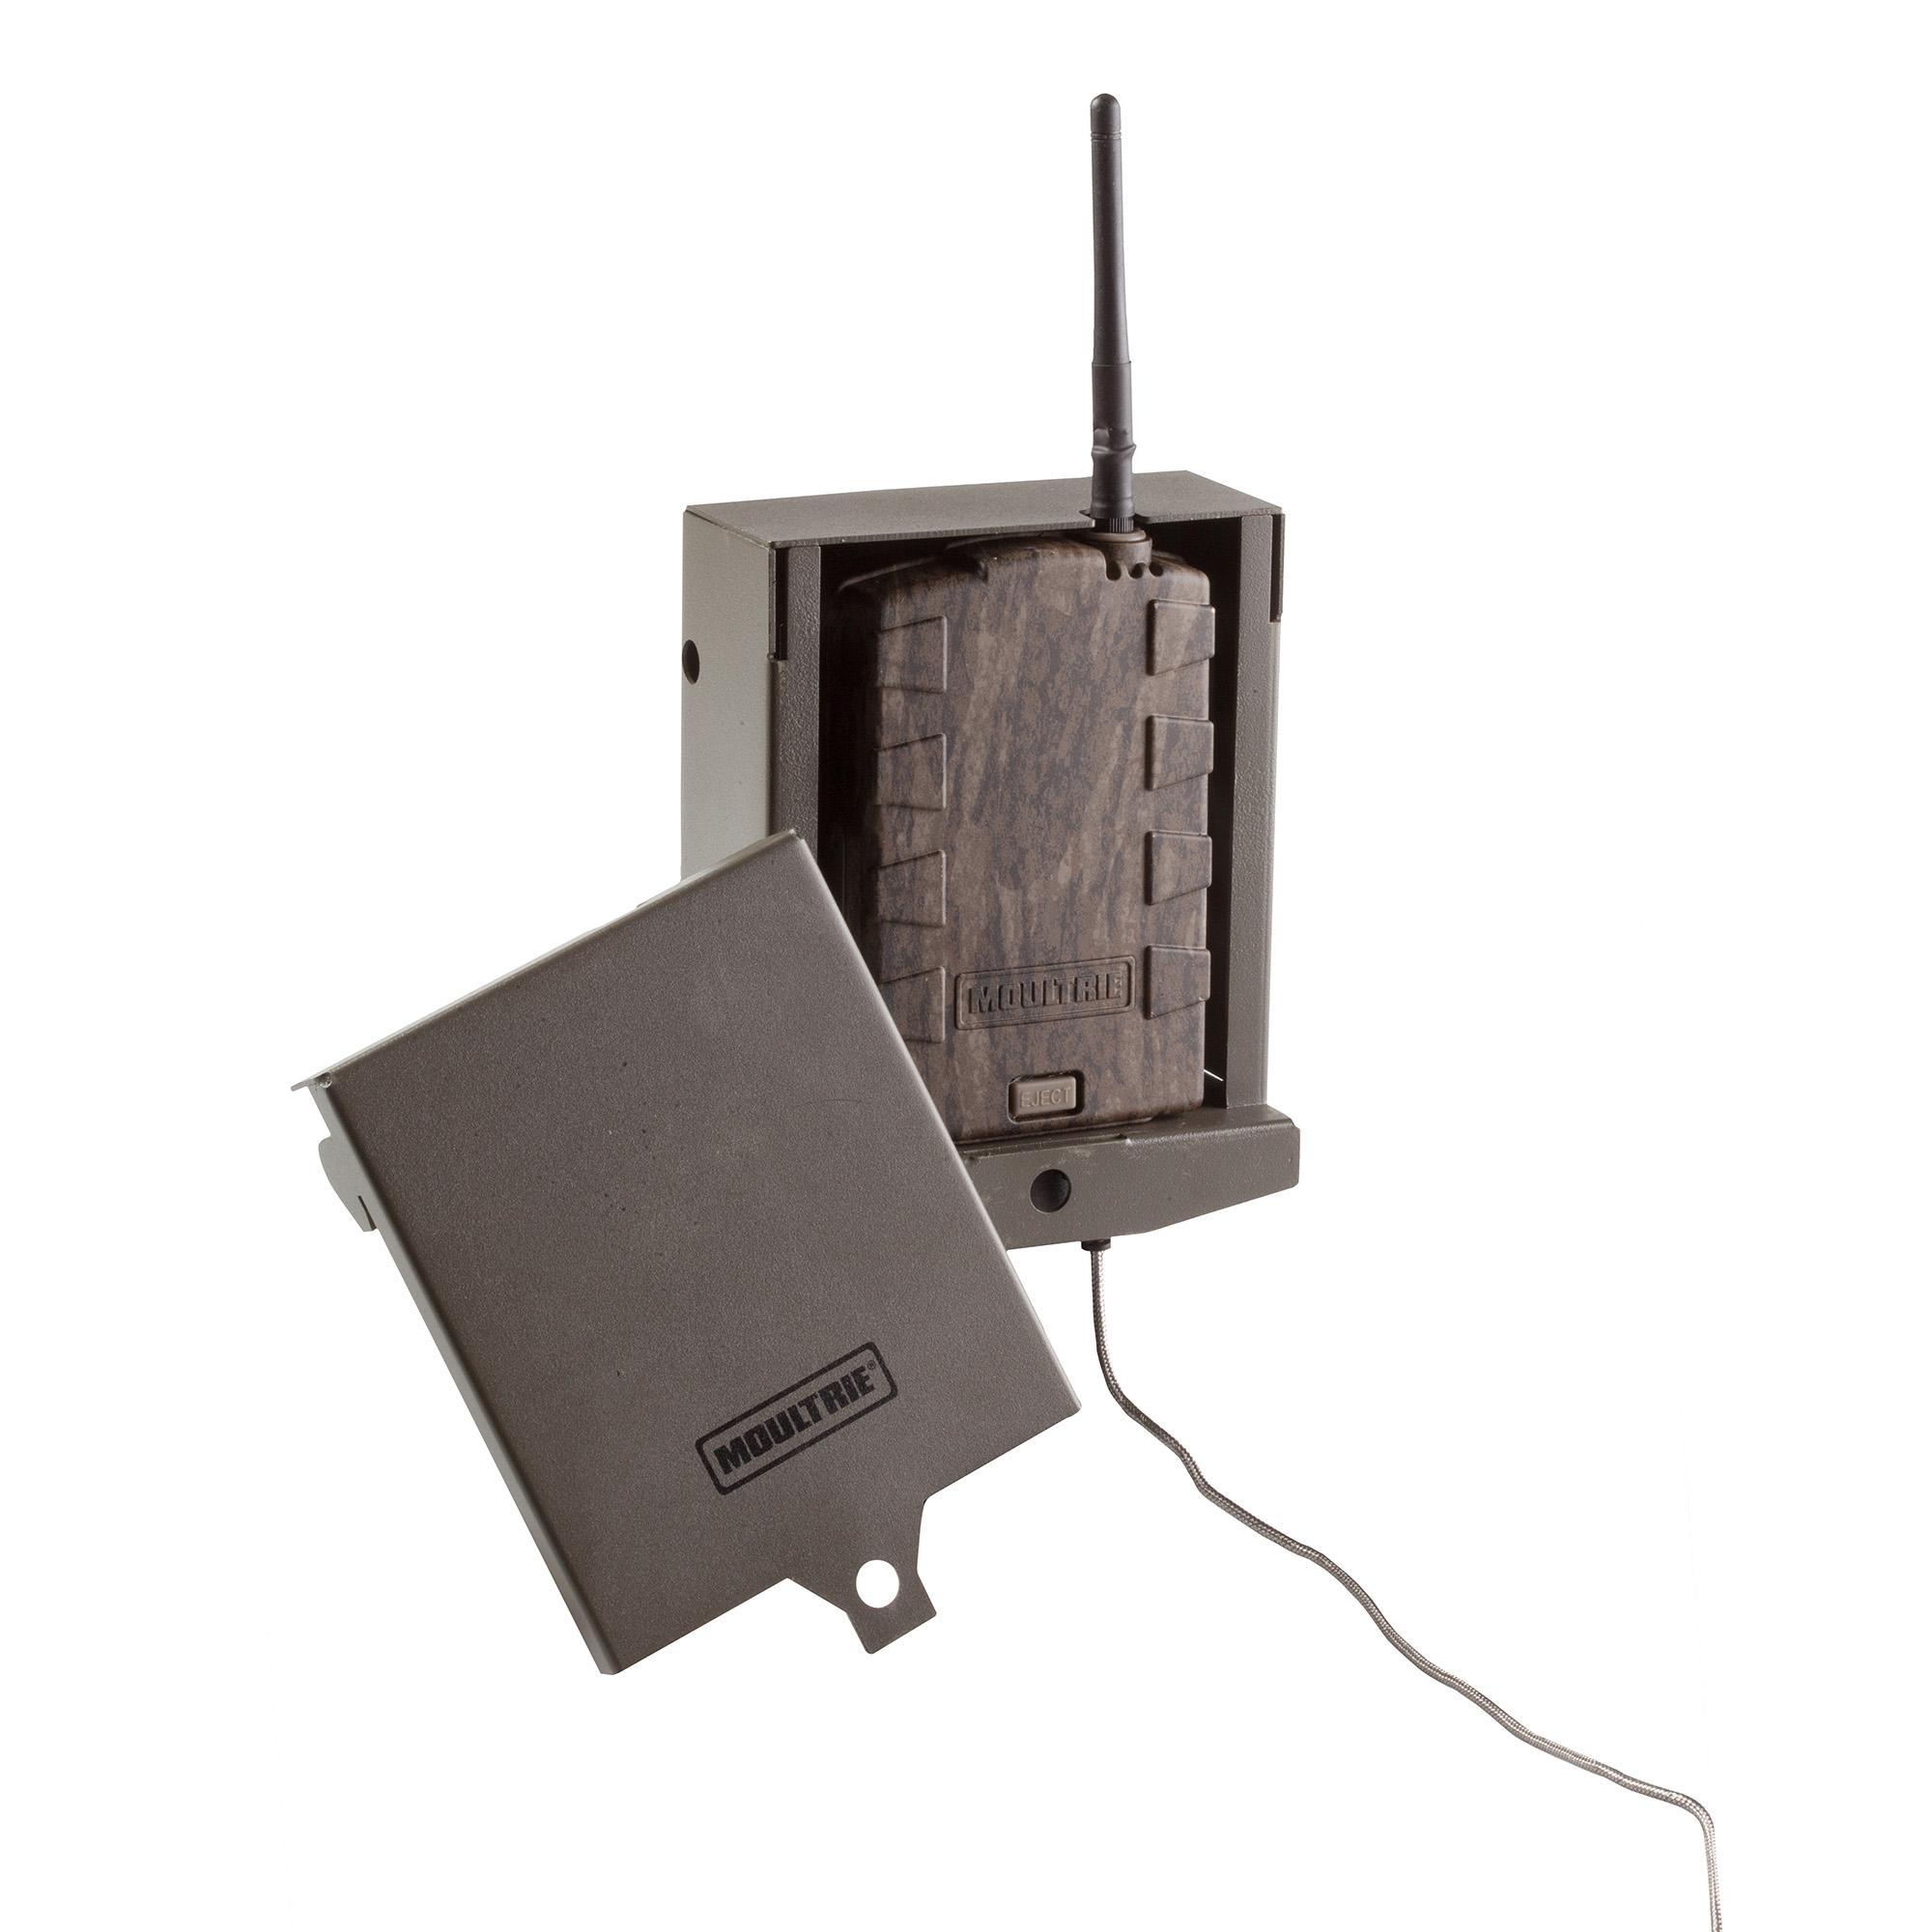 Moultrie Mobile Wireless Field Modem Mv1 >> Moultrie Mobile Wireless MV1 Field Modem for Game Camera + Security Box Case